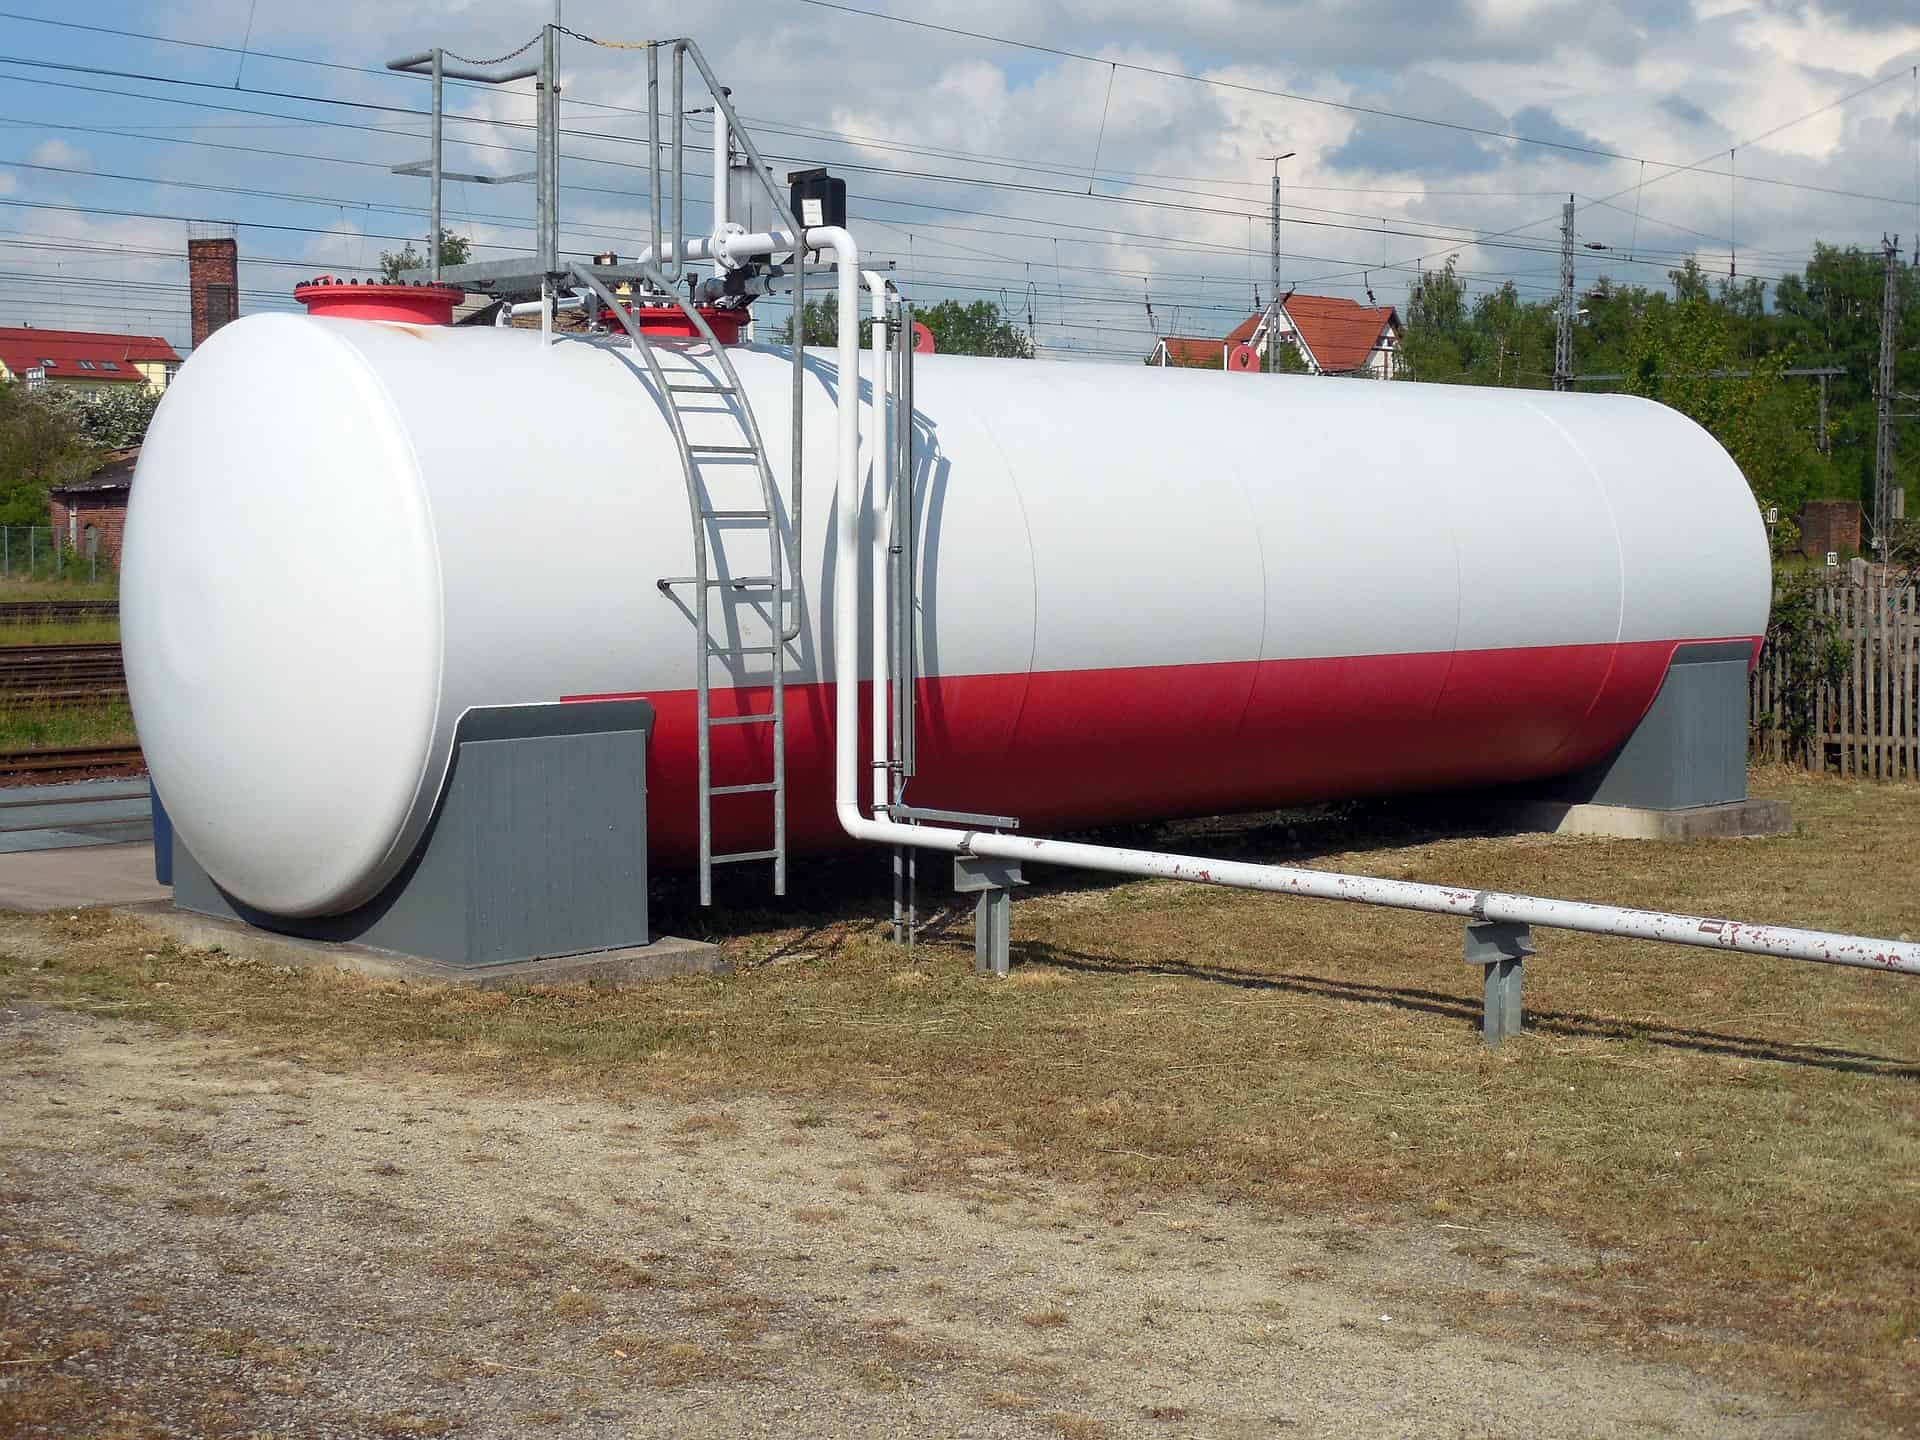 tank-783495